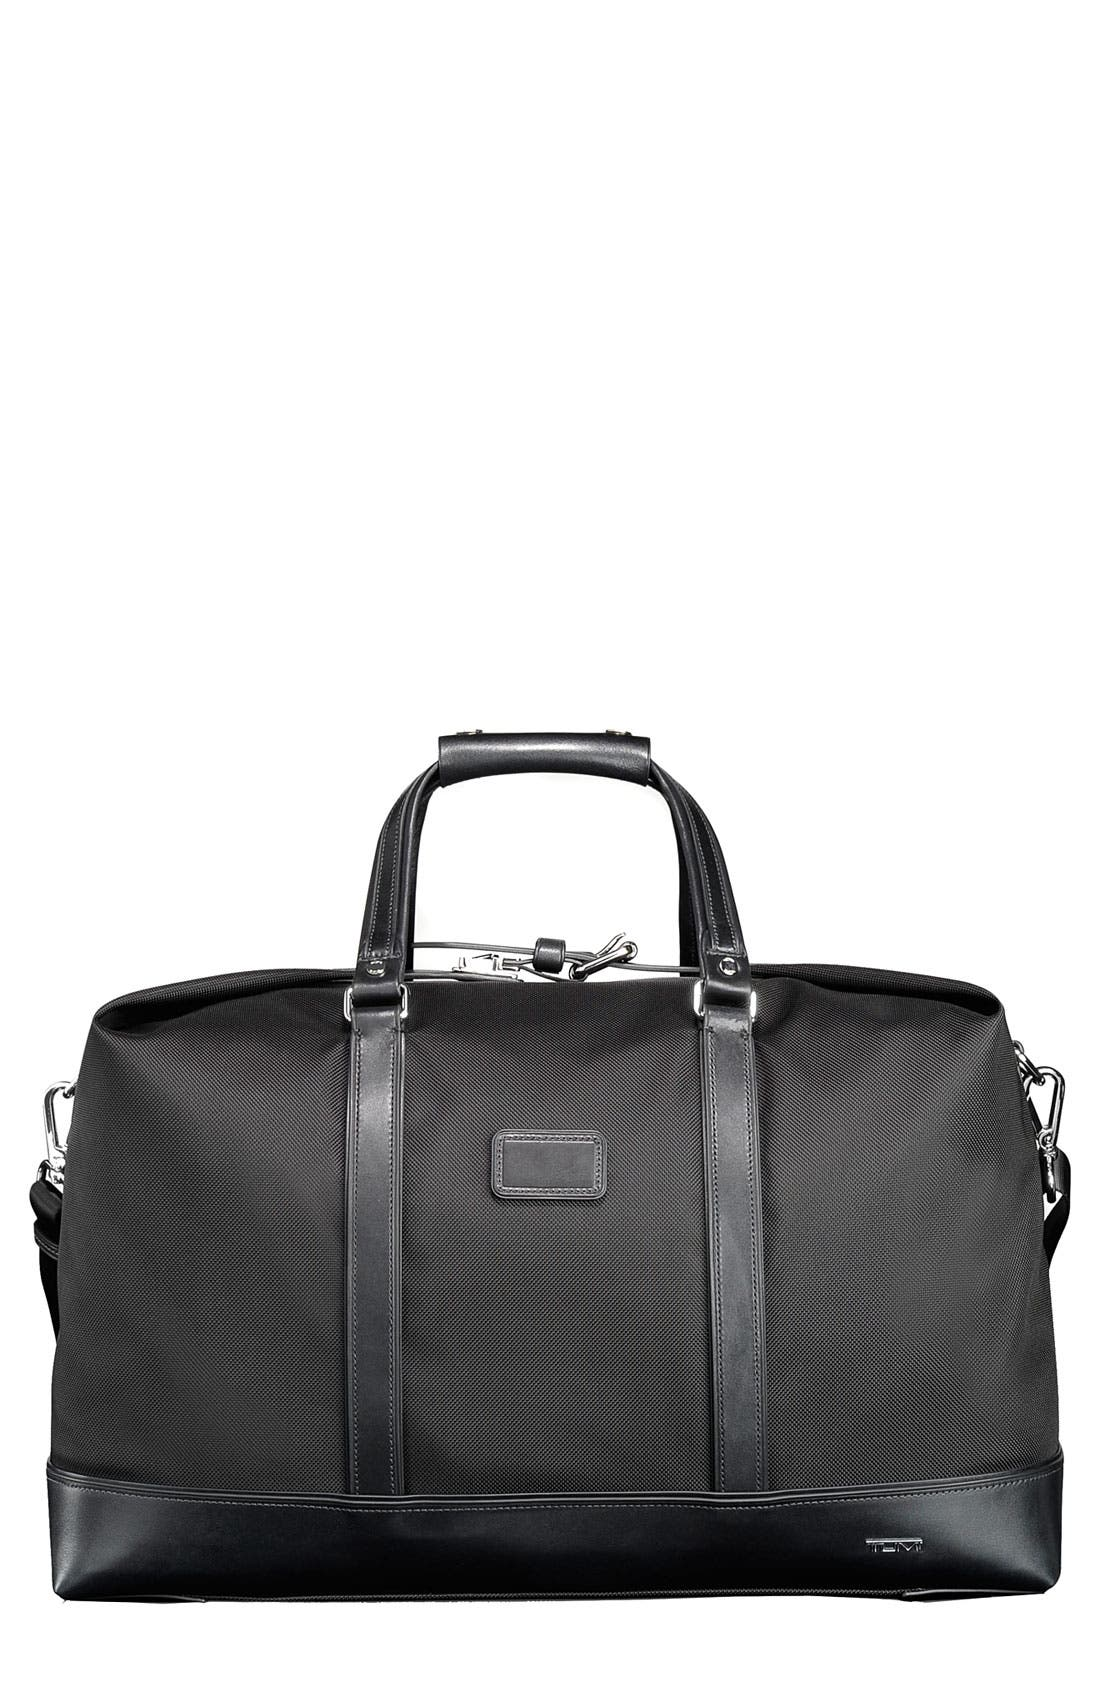 Main Image - Tumi 'Bedford - Westley' Duffel Bag